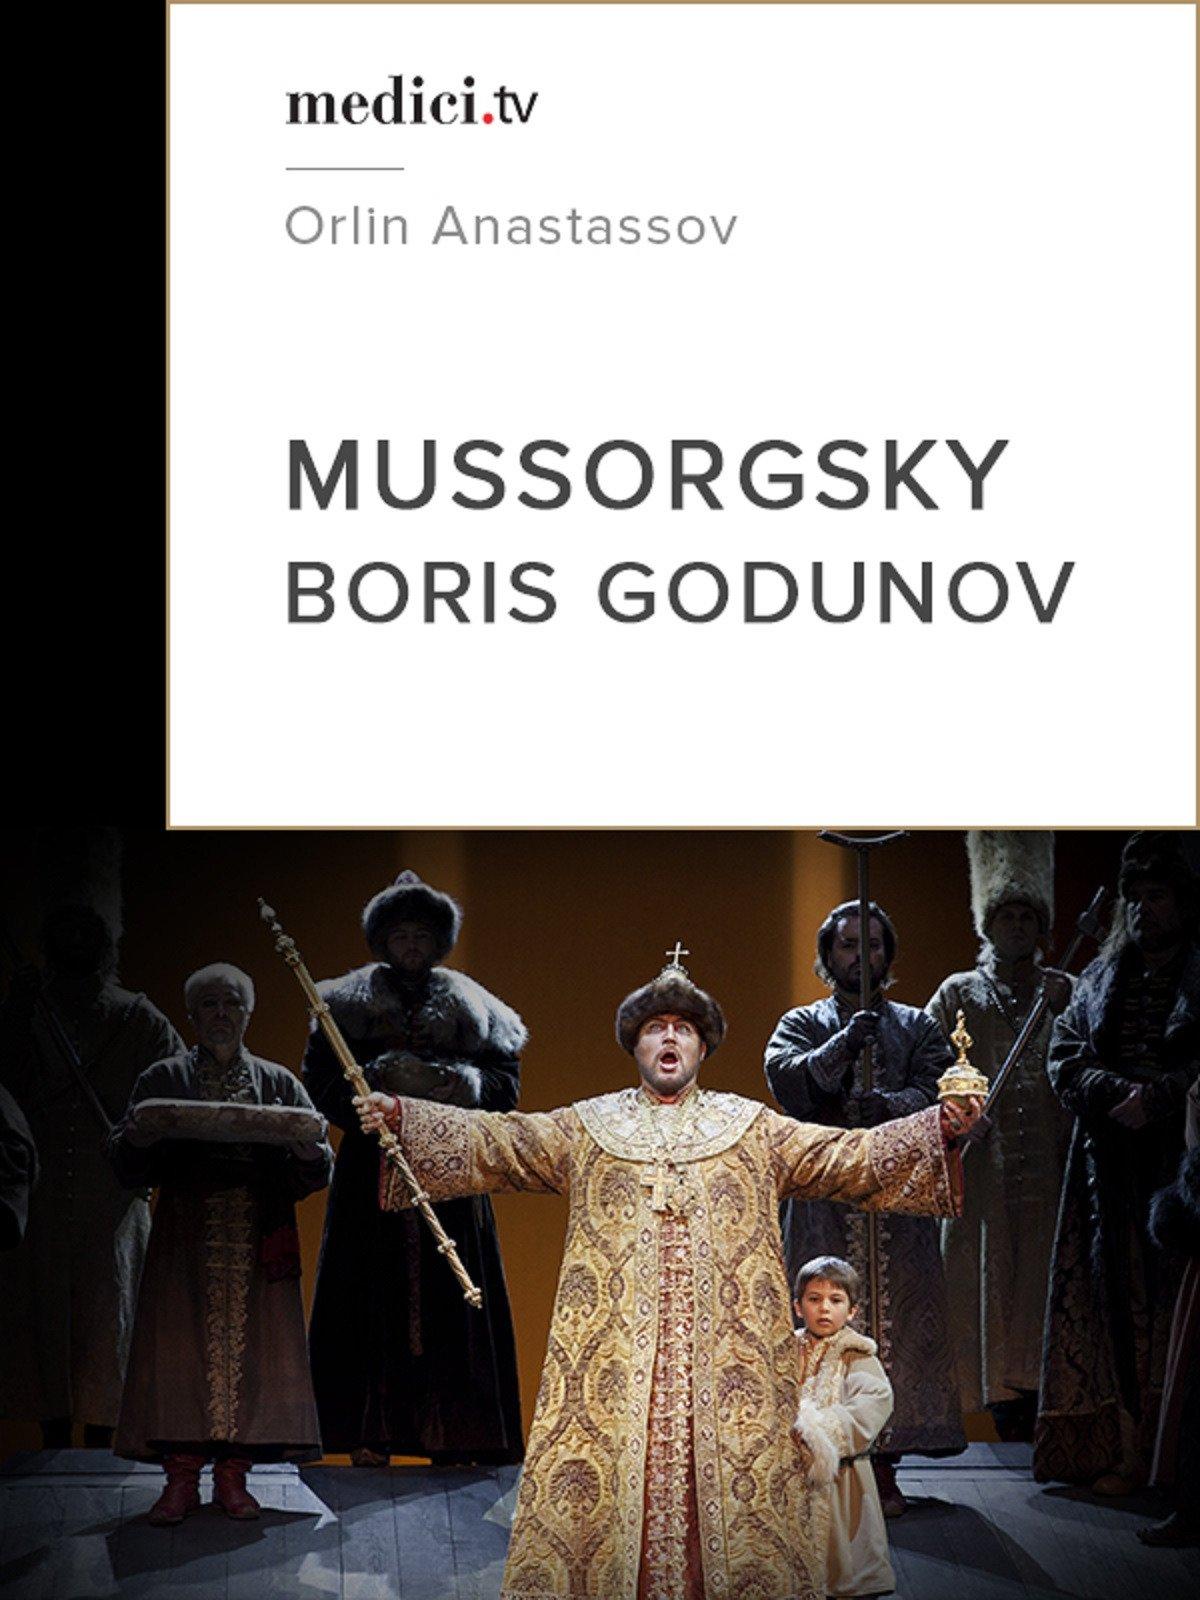 Mussorgsky, Boris Godunov on Amazon Prime Video UK